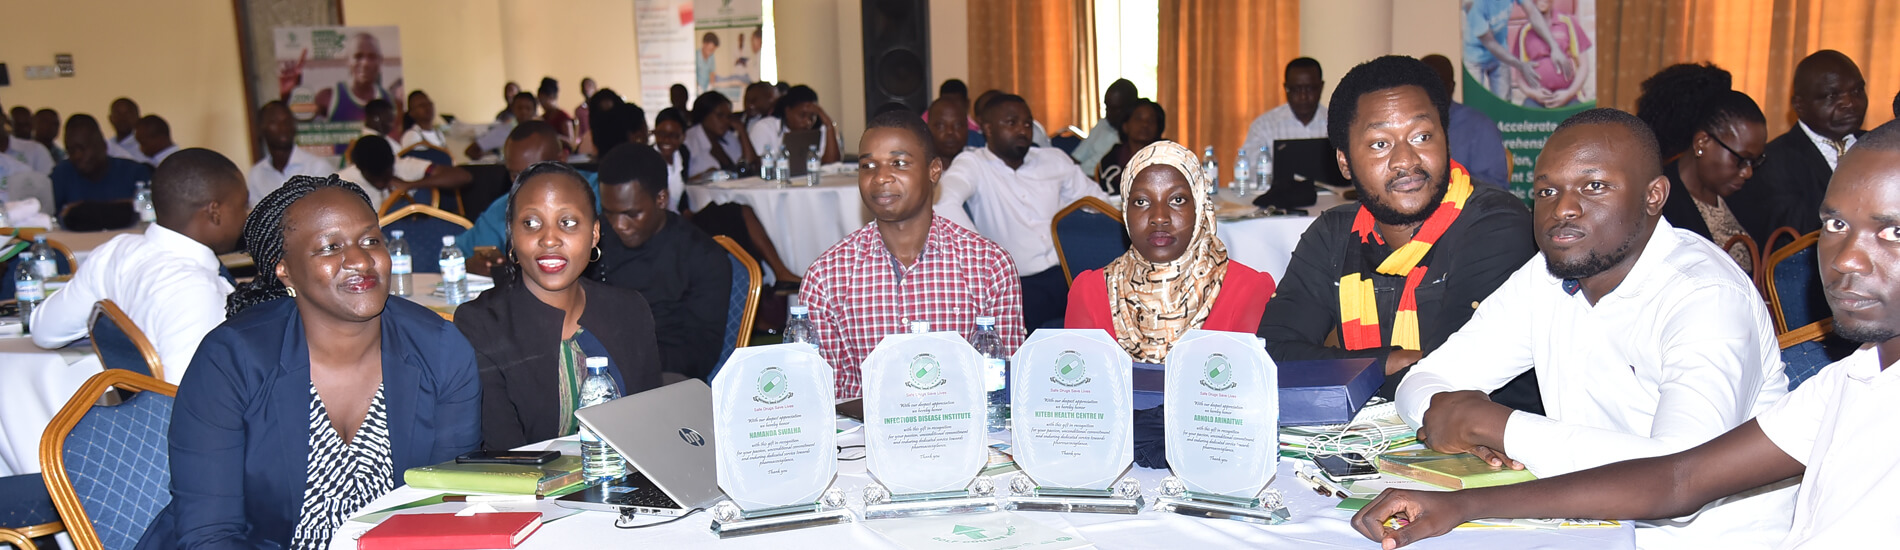 IDI awarded for pharmacovigilance